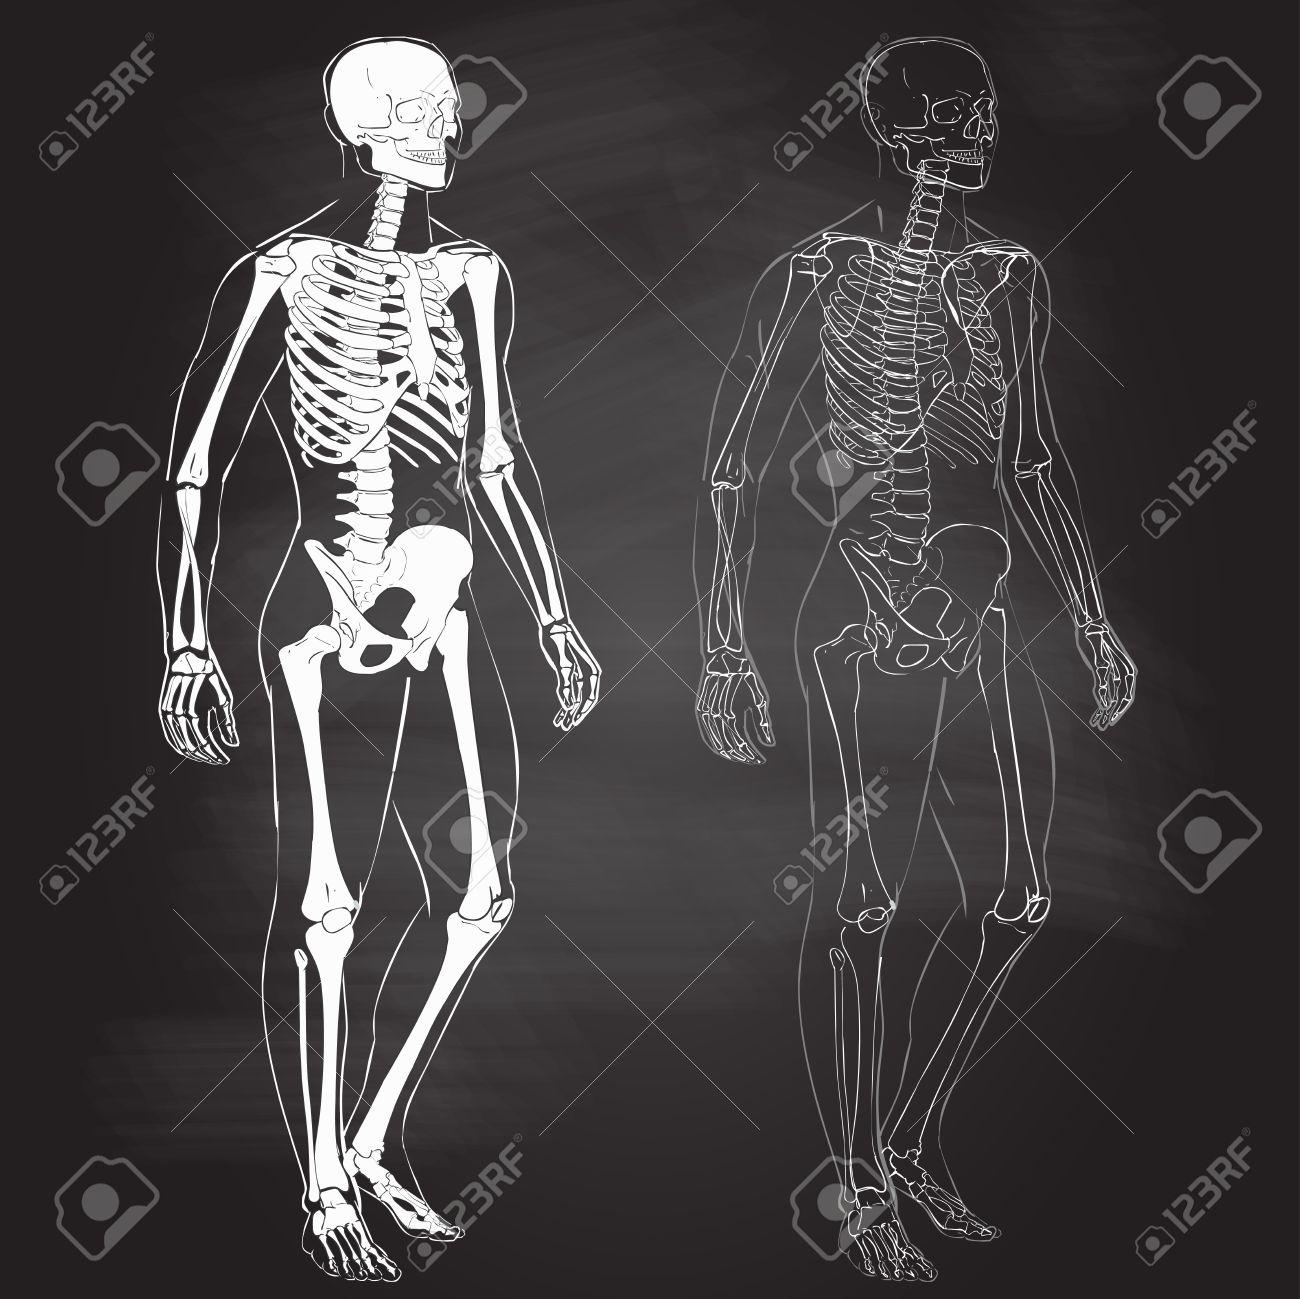 Human Body Parts Skeletal Man Anatomy Vector Illustration Chalk